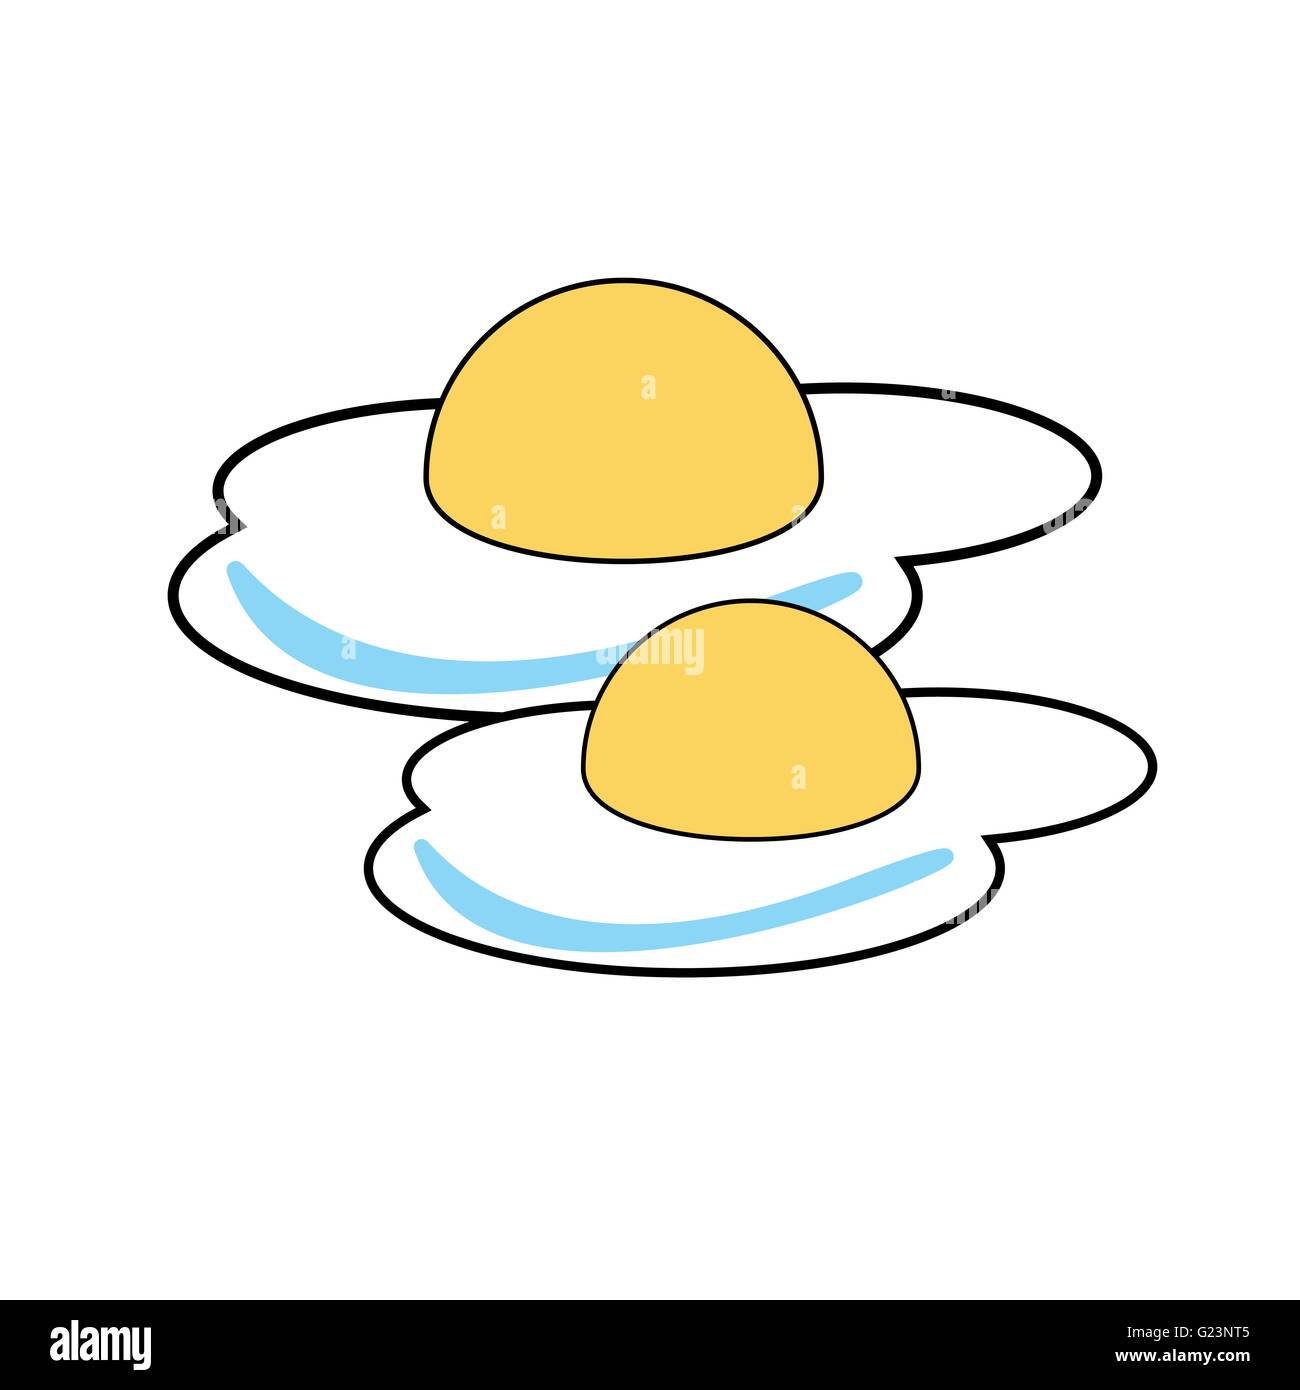 Fried Eggs vector illustration - Stock Image